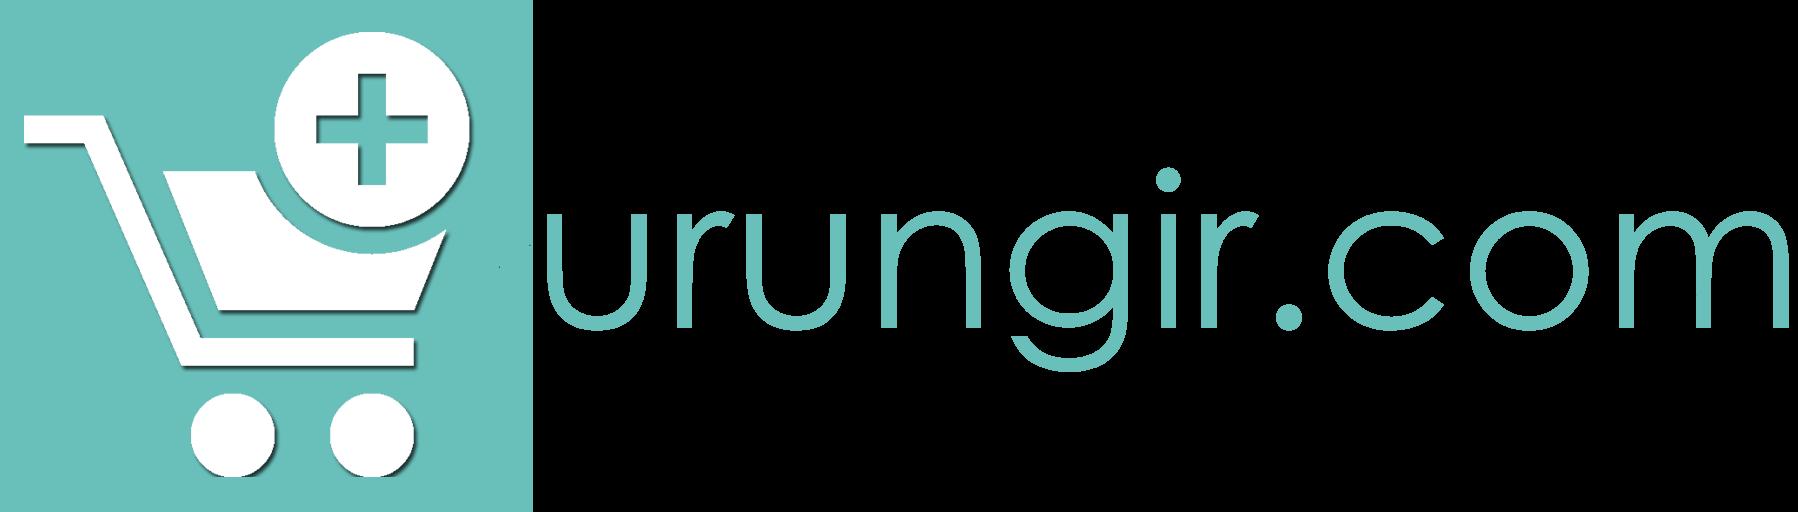 Ürüngir.com